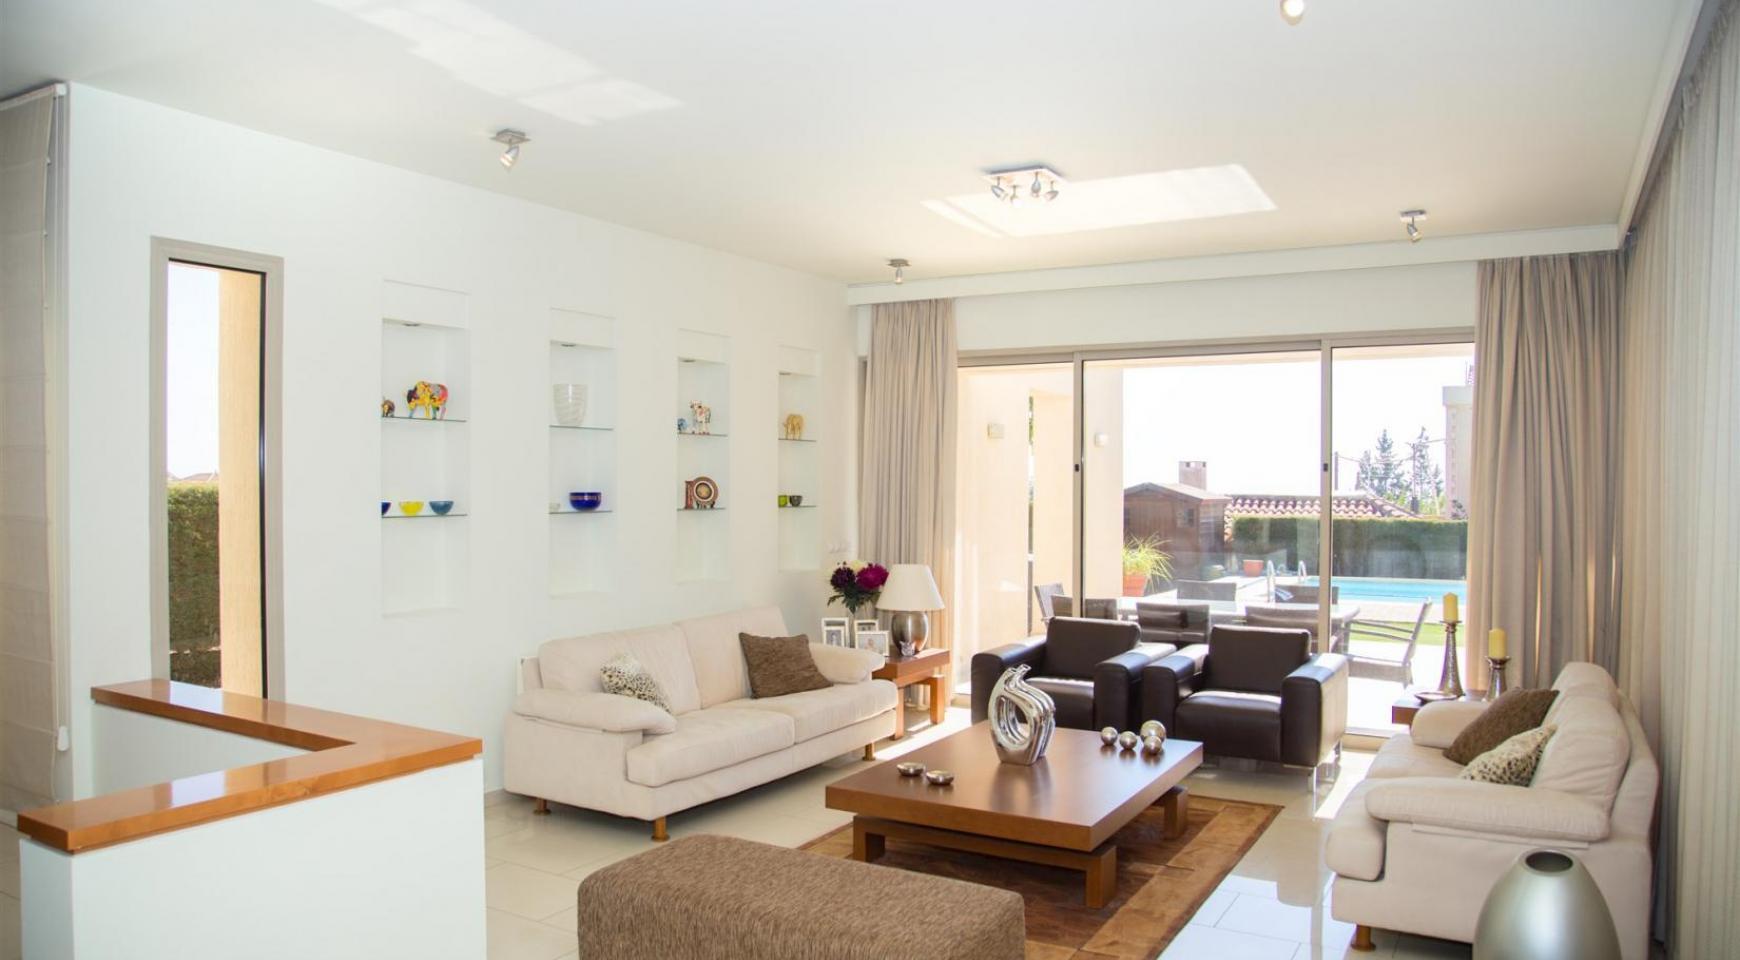 Modern Luxury 4 Bedroom Villa in Sfalagiotisa, Agios Athanasios - 12